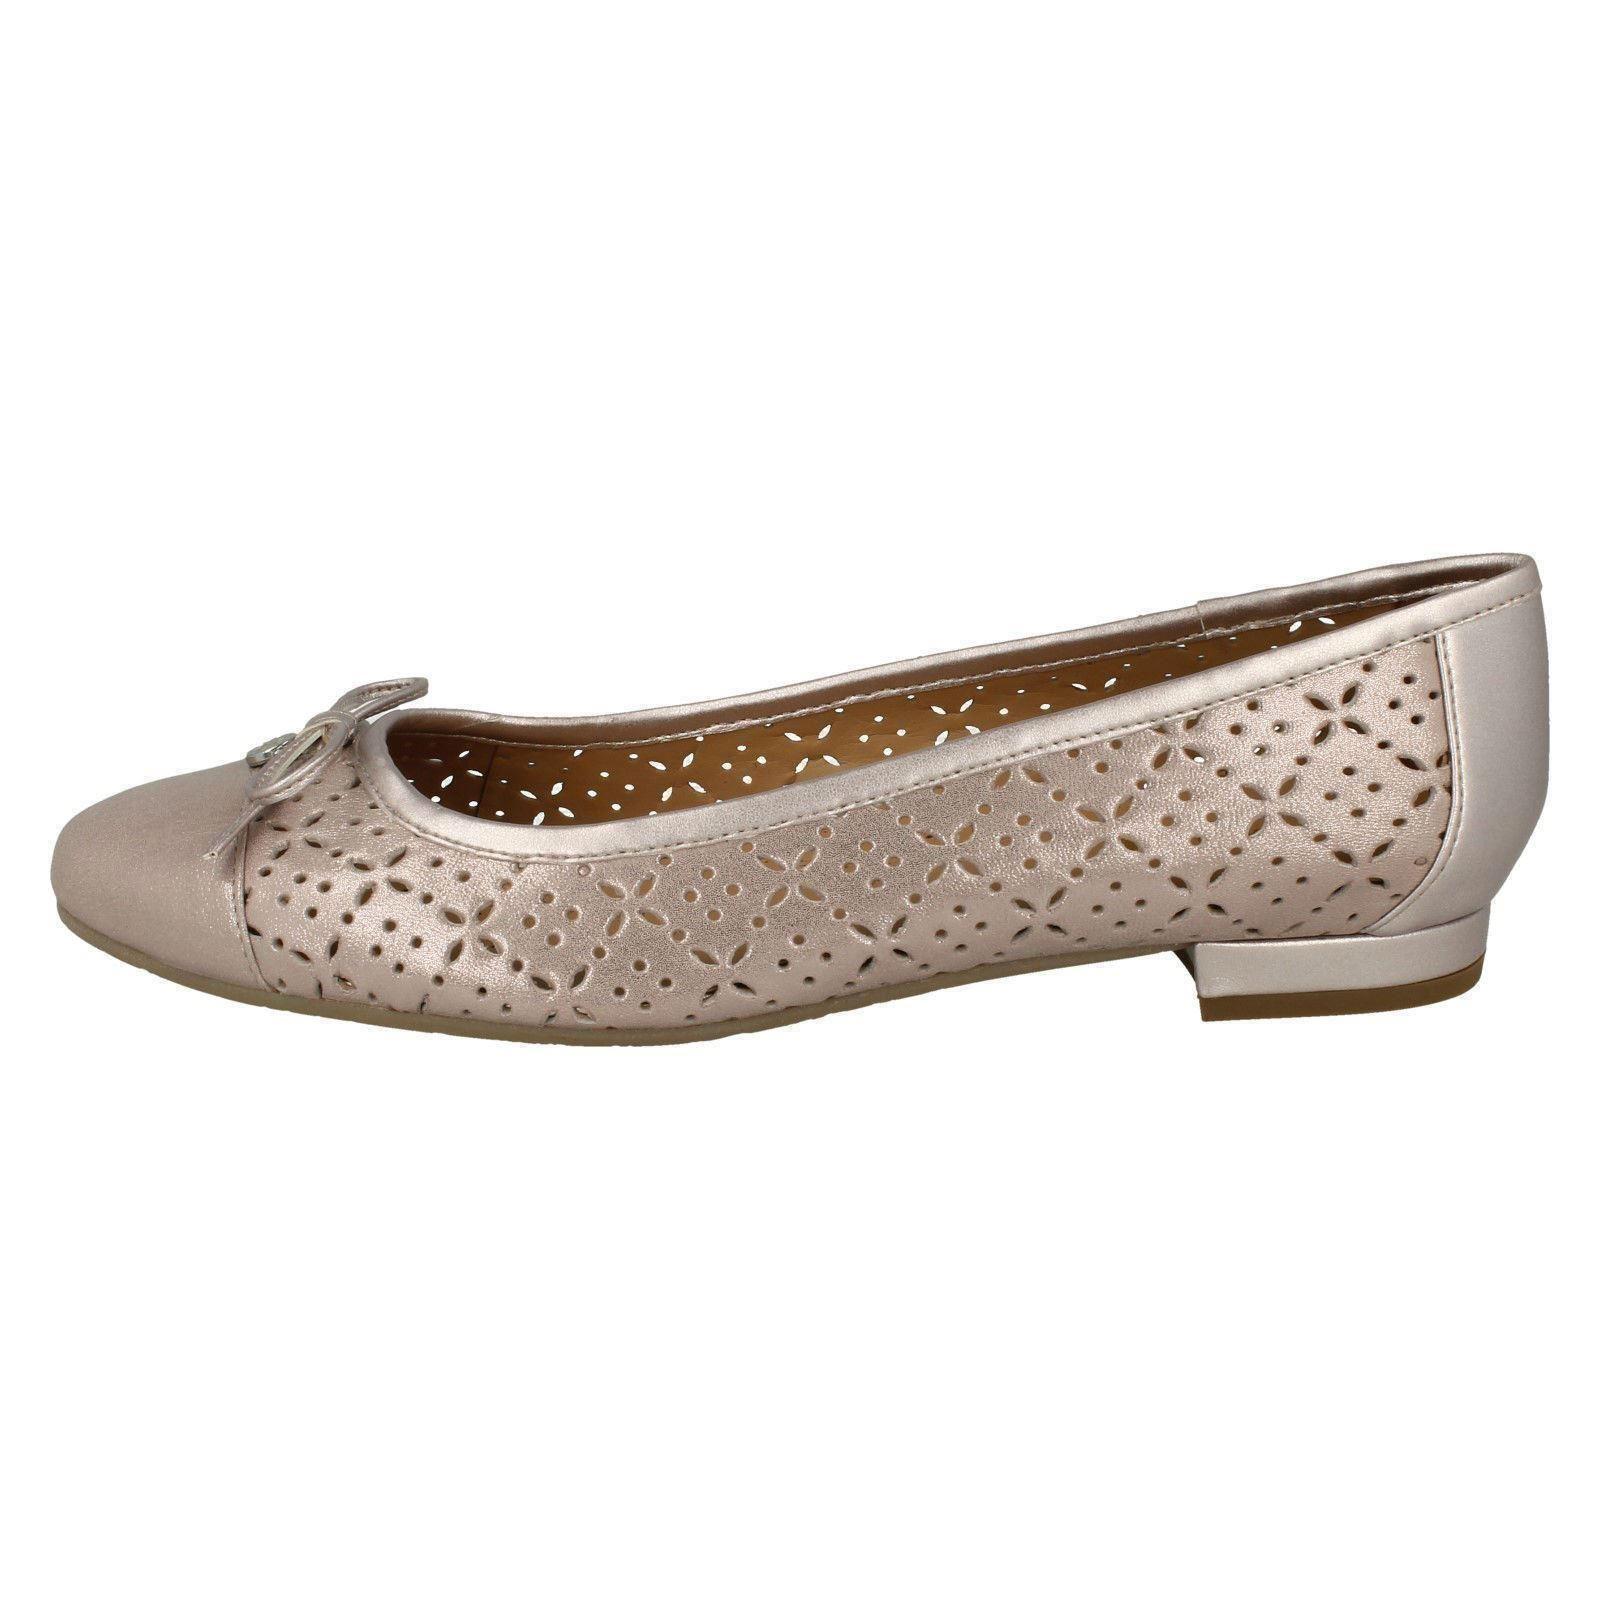 Damenschuhe Van Van Damenschuhe Dal Ballerina Style Schuhes Wentworth c698a1